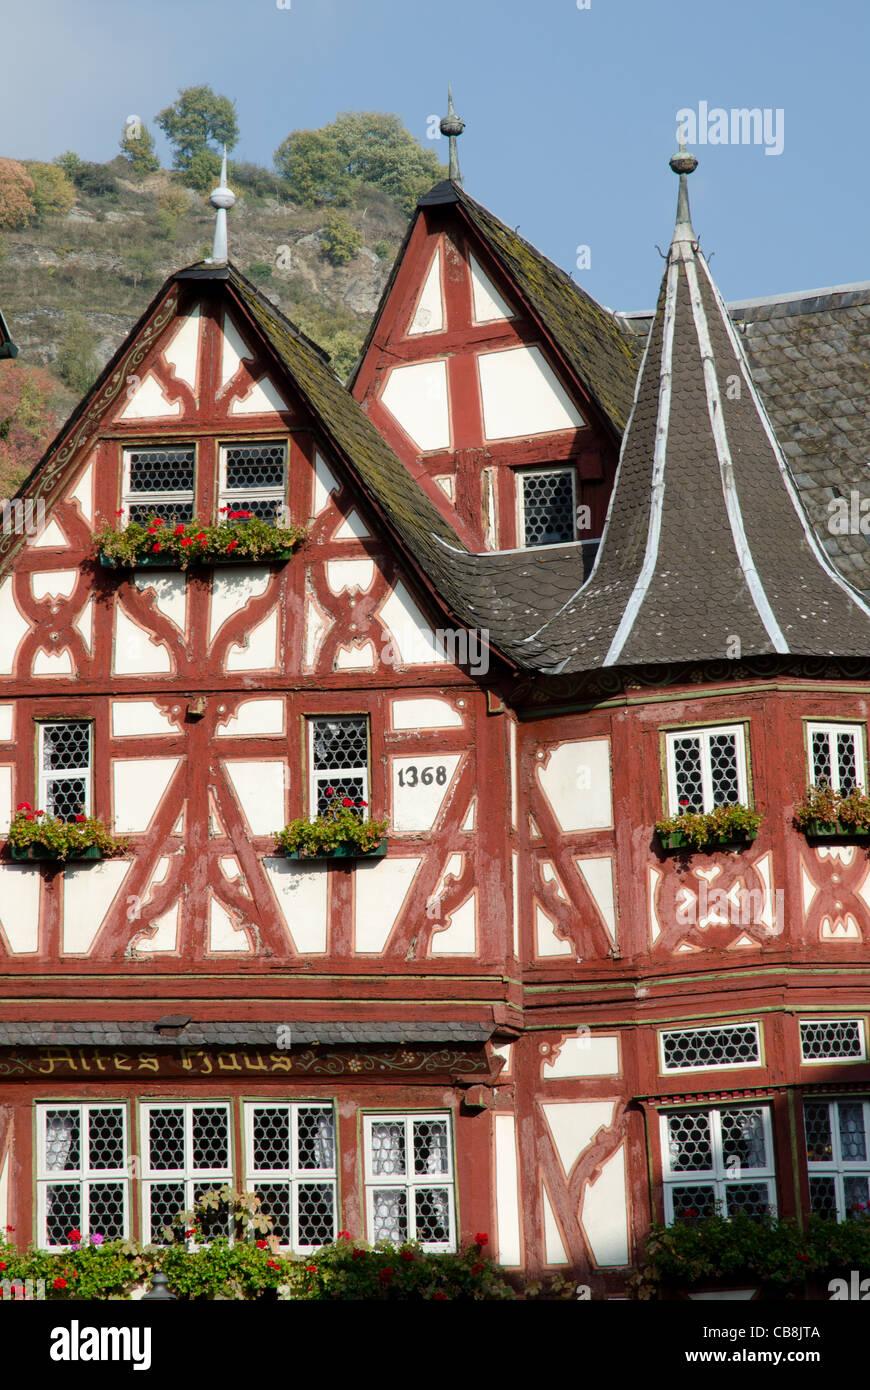 Fachwerk Fachwerkhaus in Bacharach, Rheinland-Pfalz ...